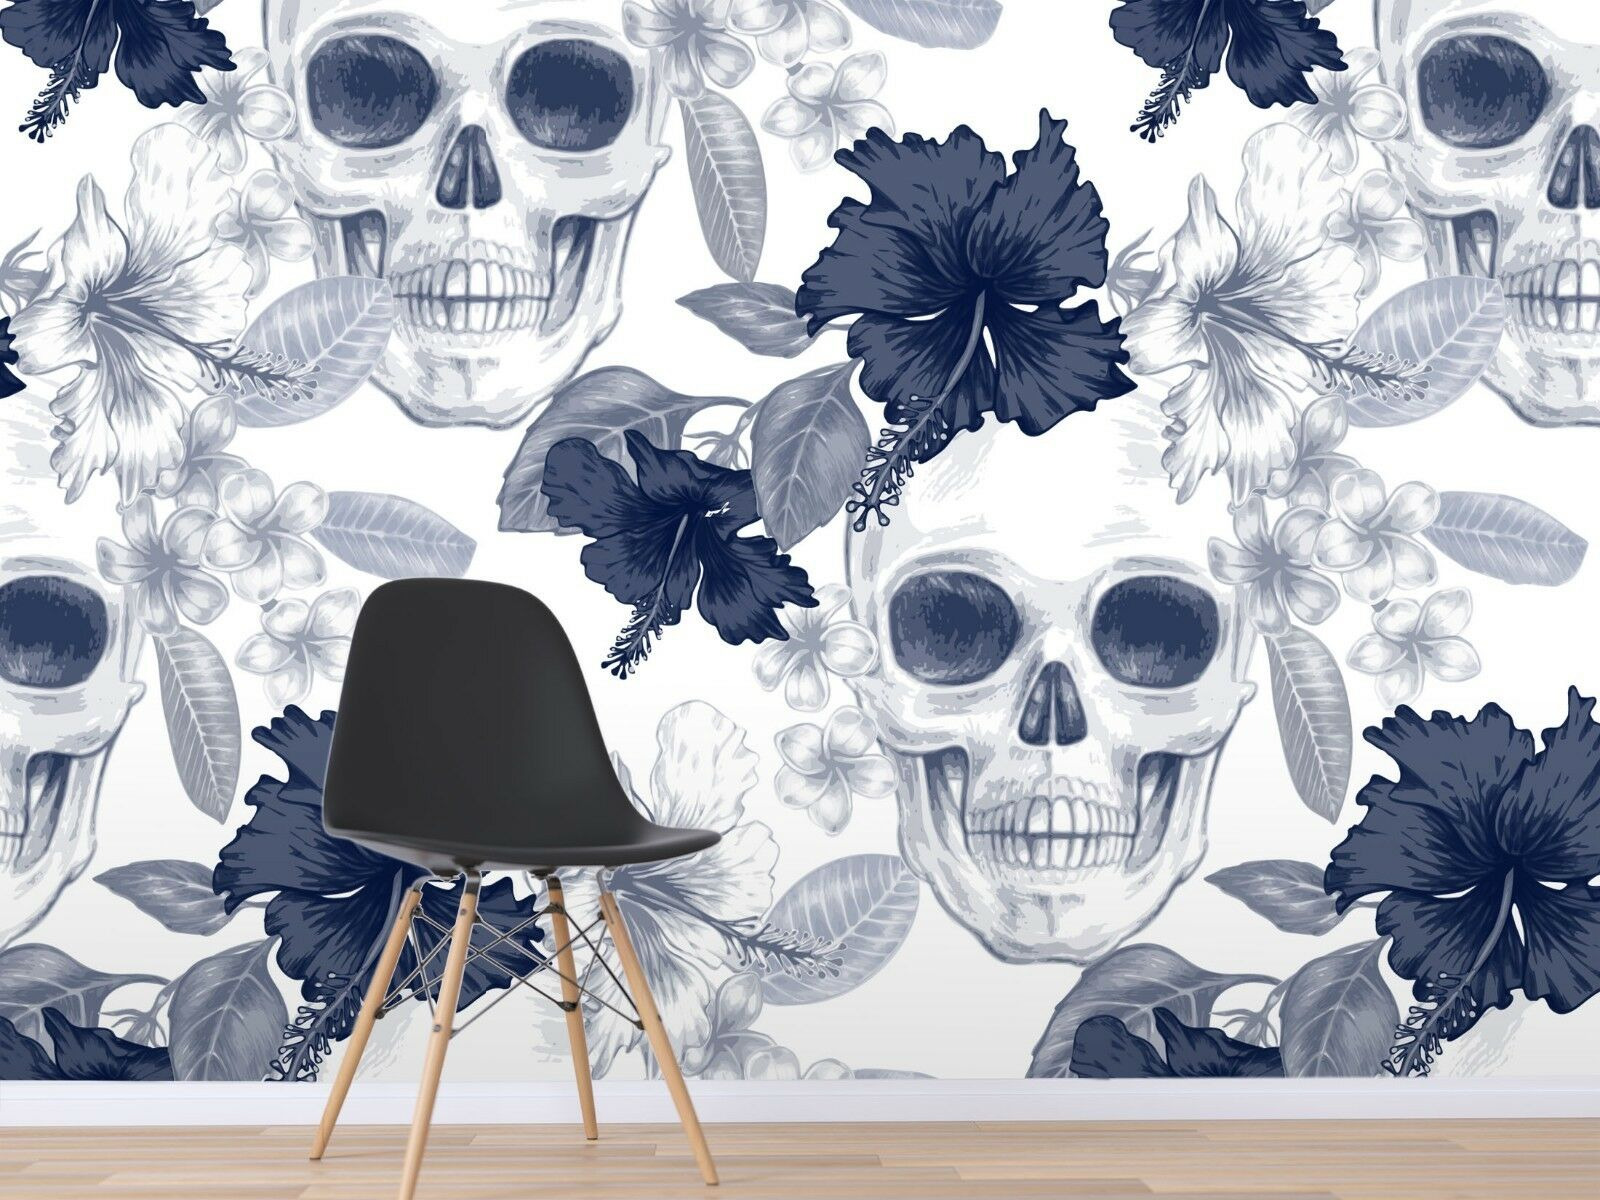 3D Grau Schädel 999 Tapete Wandgemälde Tapete Tapeten Bild Familie DE Sidney